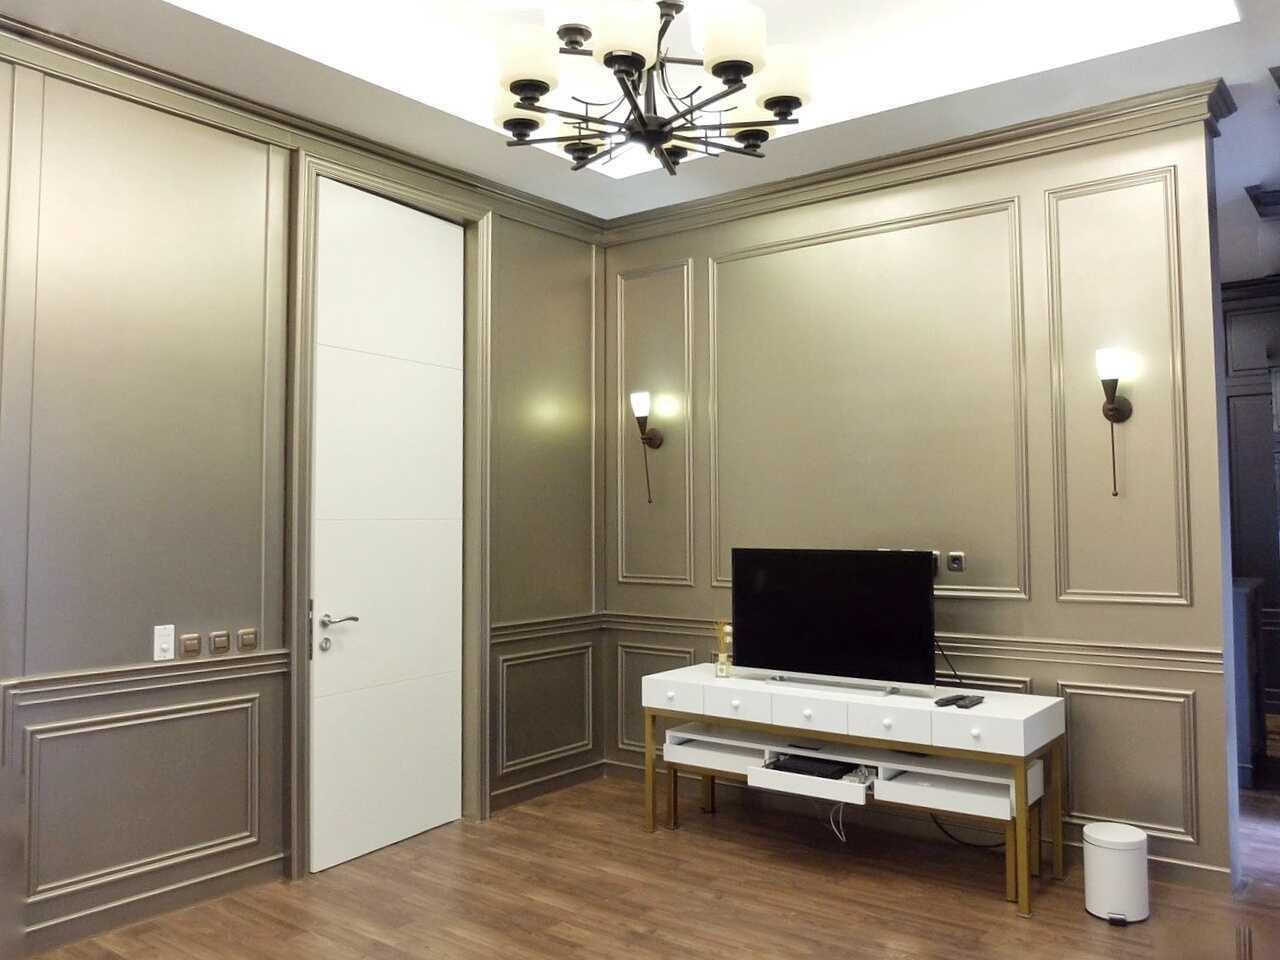 7Design Architect Mrs. D House Citrasun, Yogjakarta Citrasun, Yogjakarta Work Room Modern 18716